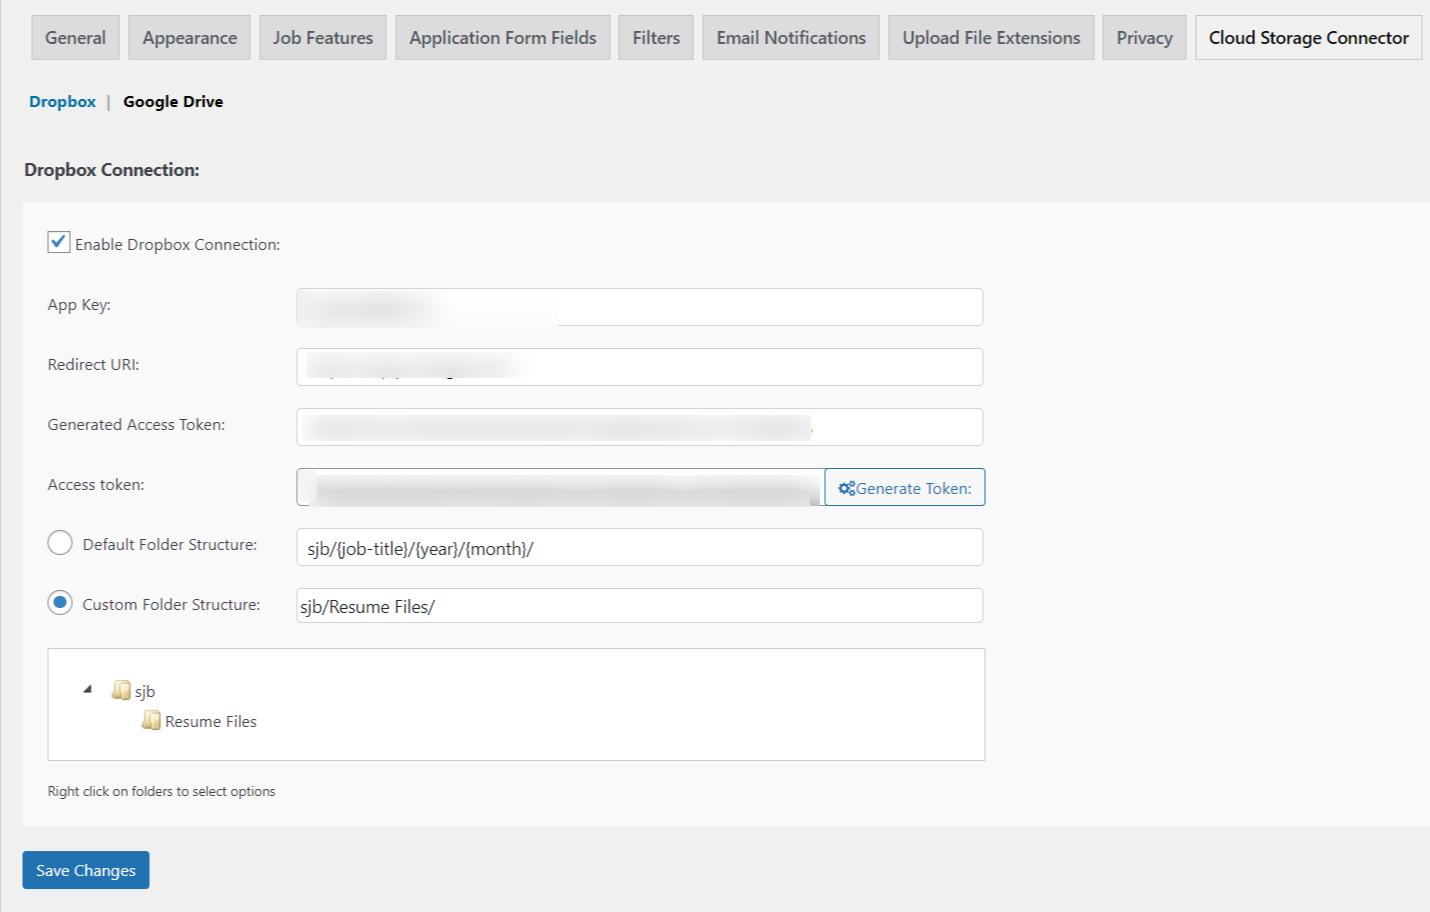 Dropbox Configuration Settings